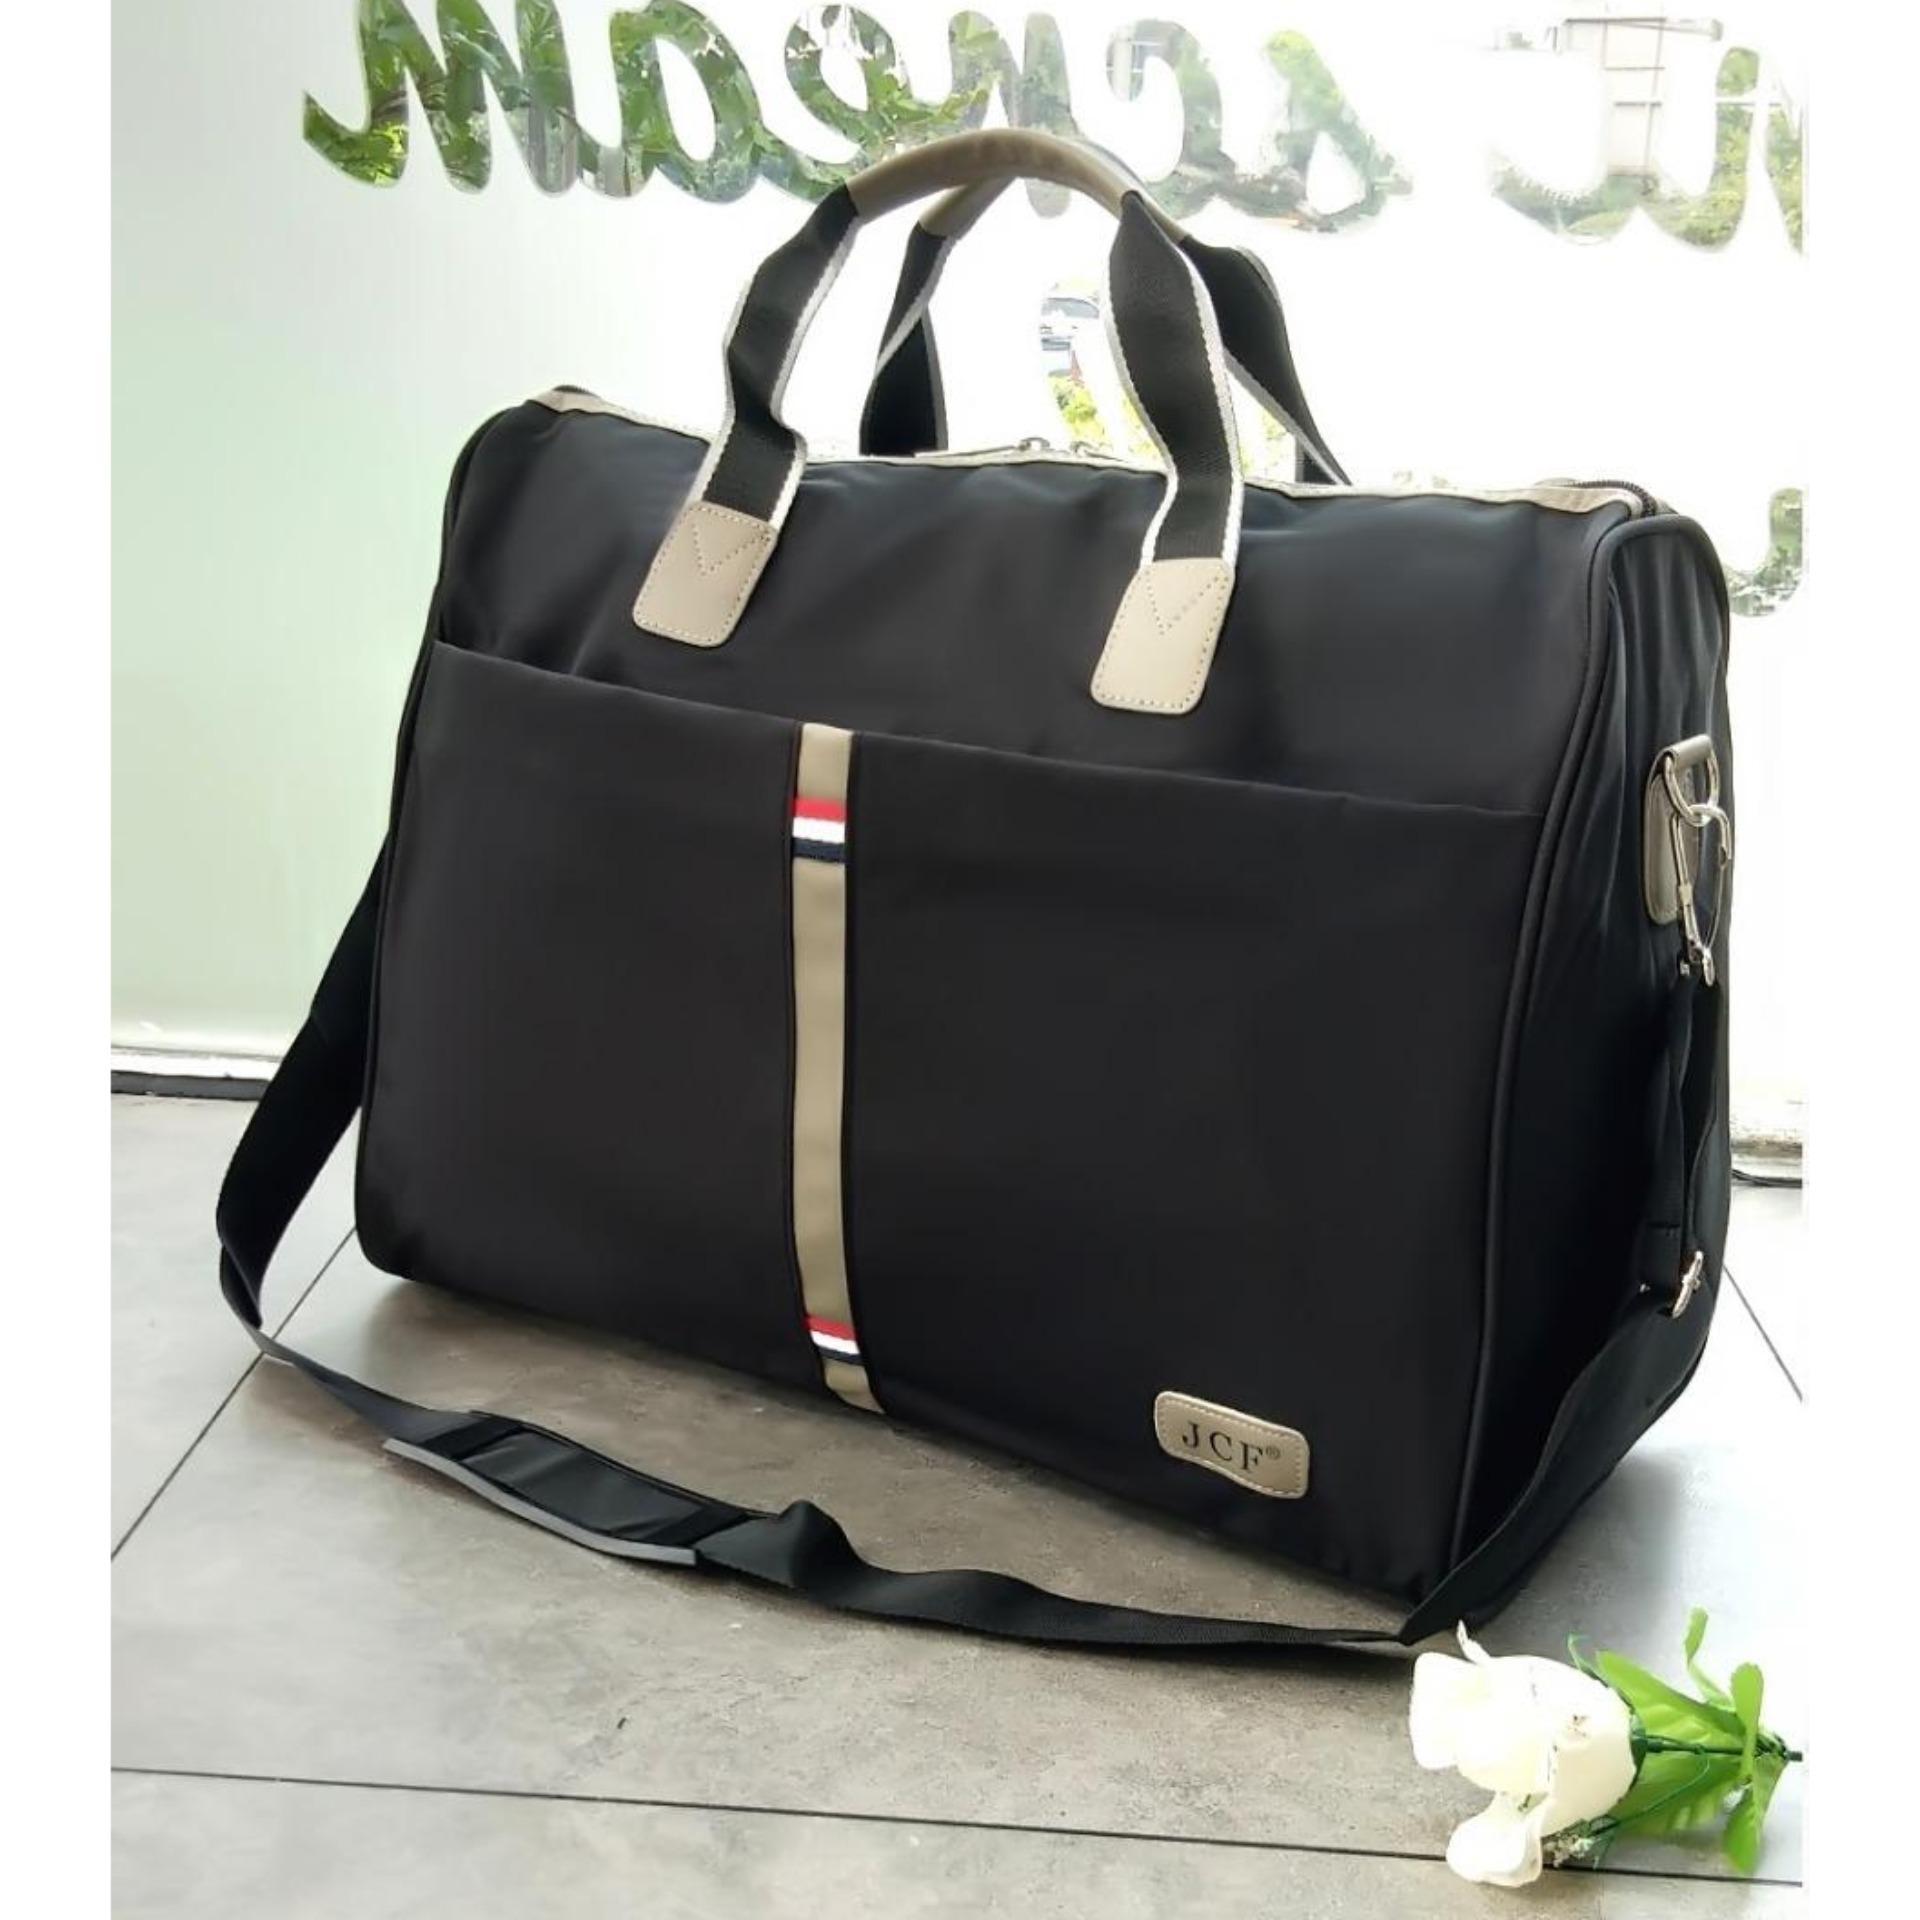 JCF Tas Travel Bag Import Kanvas Tebal Bagus Korean Style Fashion Wanita  Pria Tas Pakaian Multi The cheapest price Tas Selempang dan Jinjing ... 103ddee740